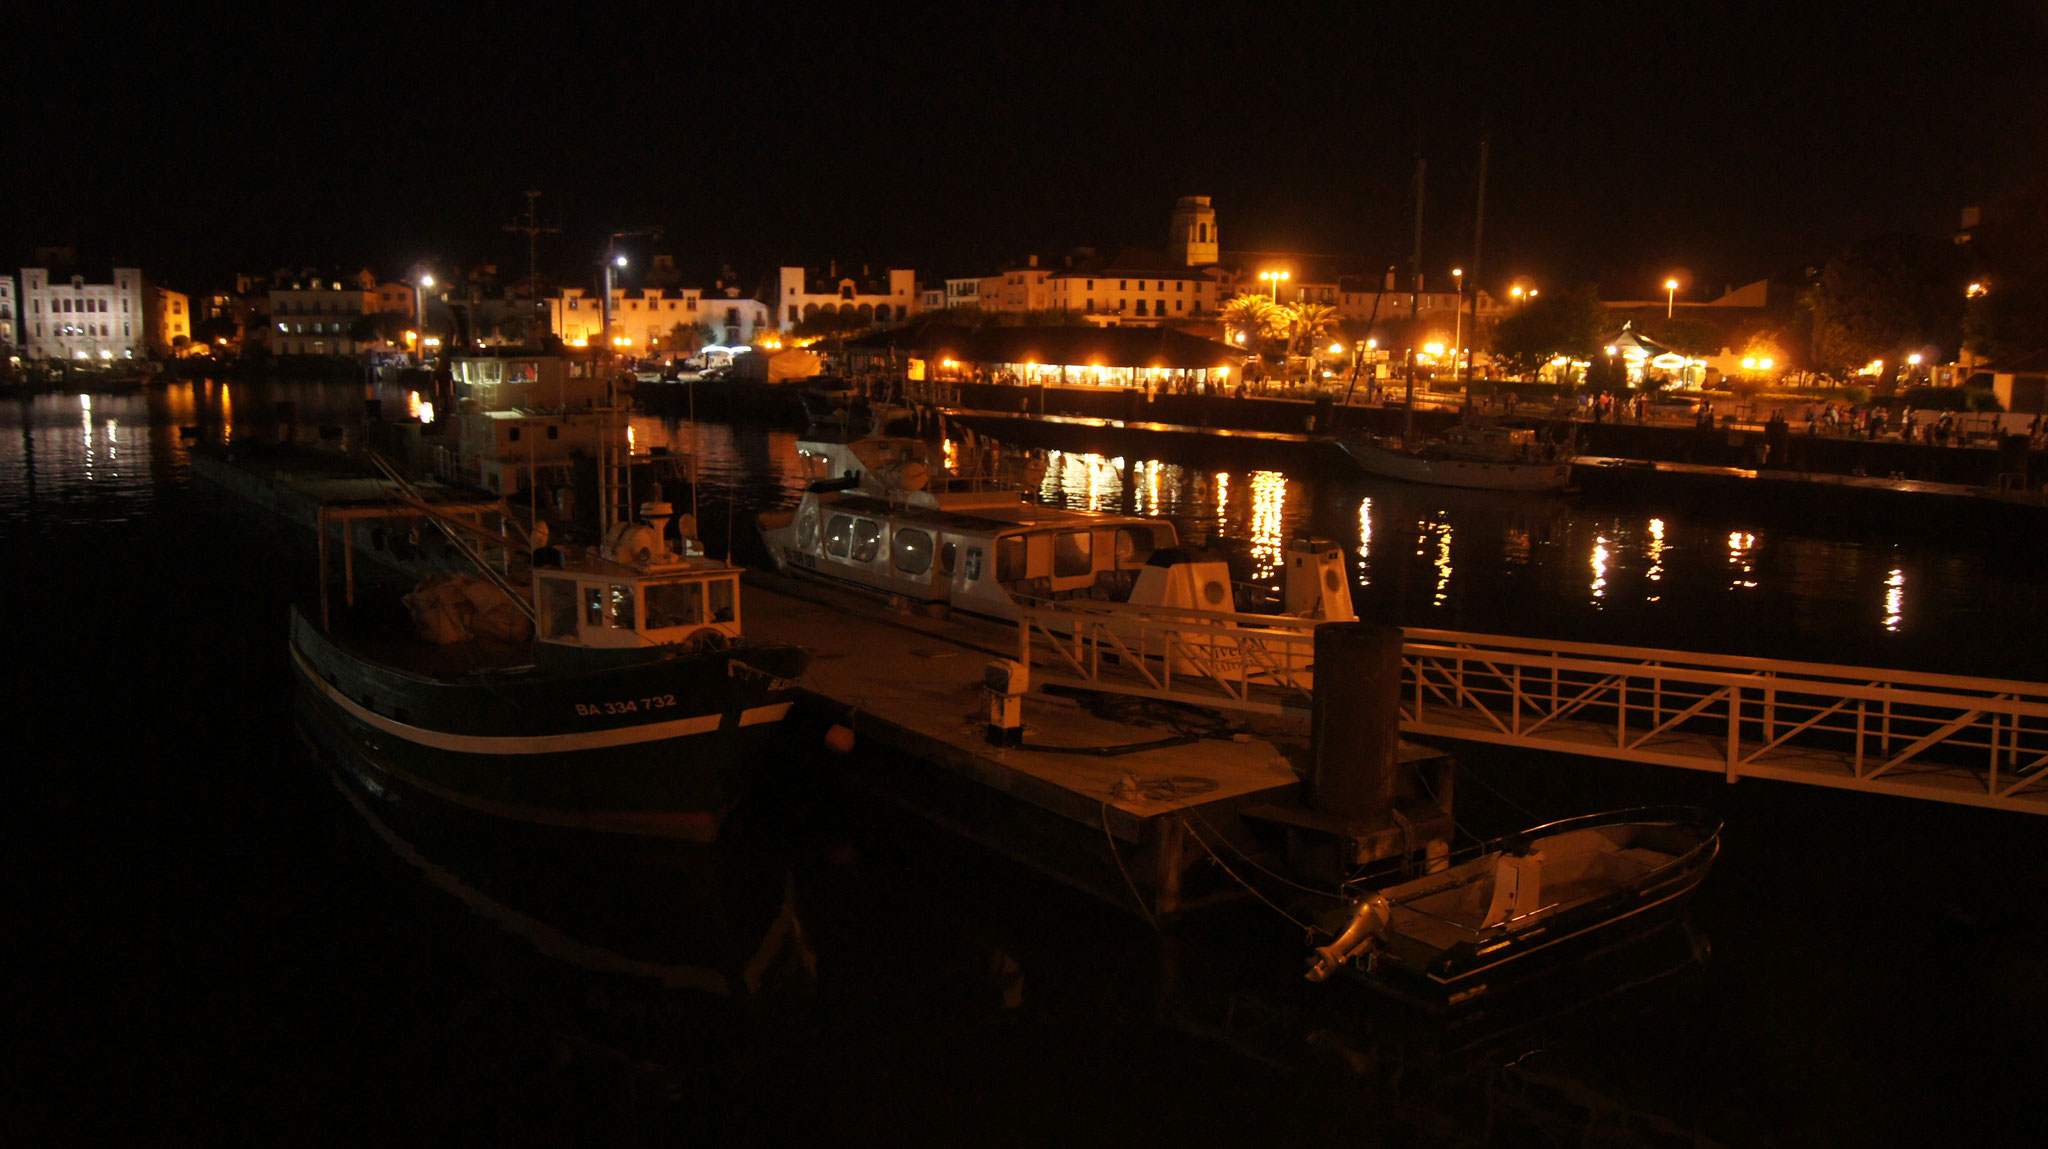 Port de ST JEAN DE LUZ ( SONY ALPHA 550)